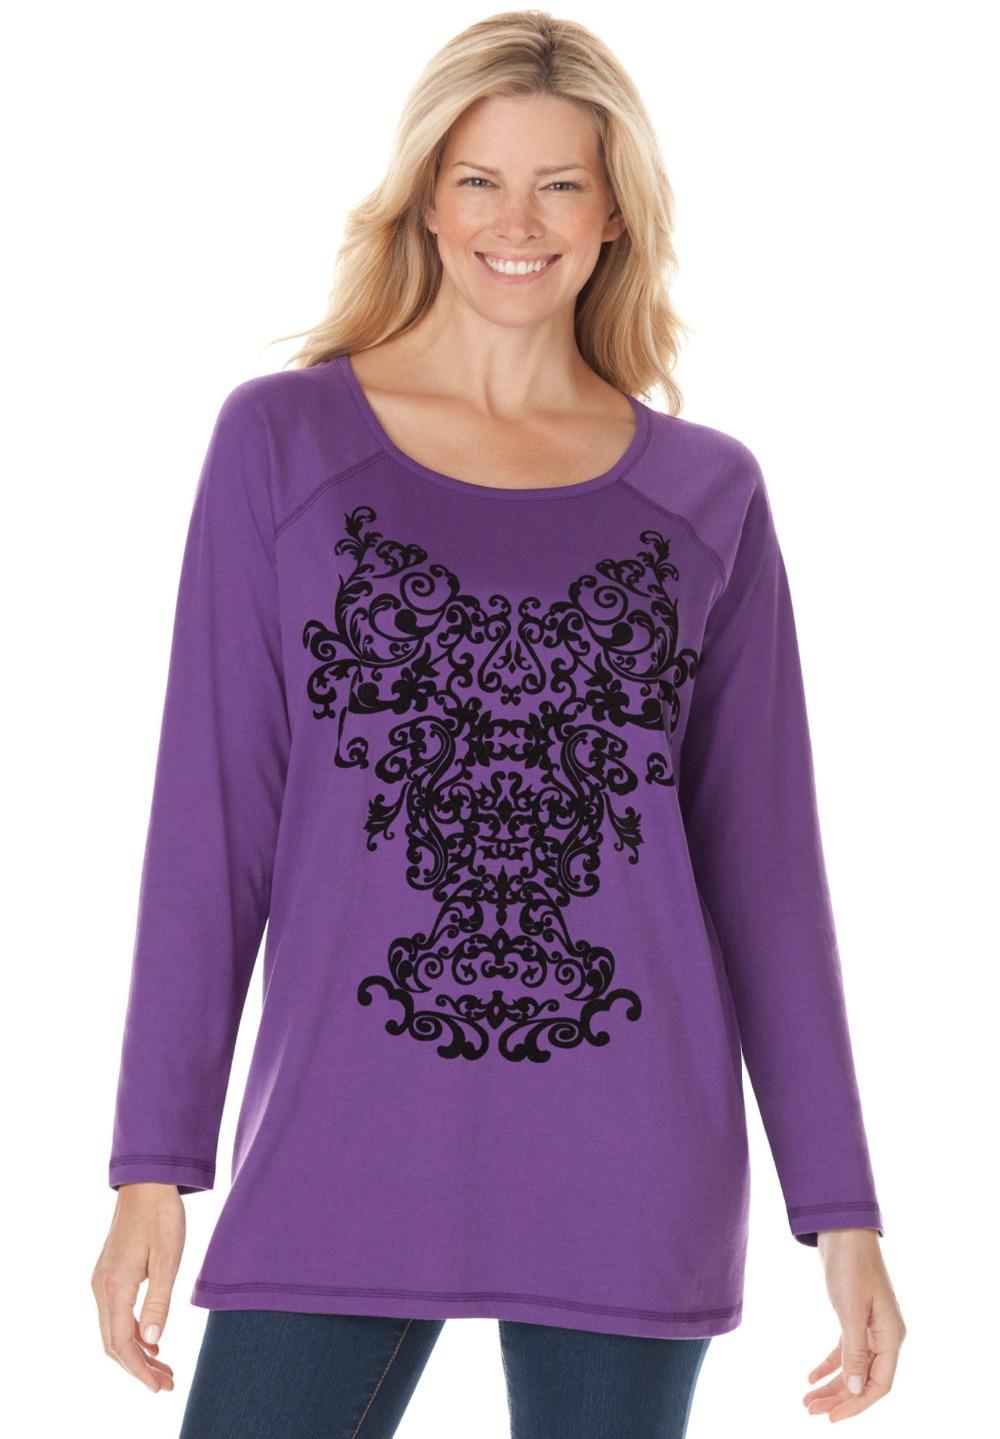 Xl 6xl Plus Size Women Velvety Print Knit Cotton Tunic Tee